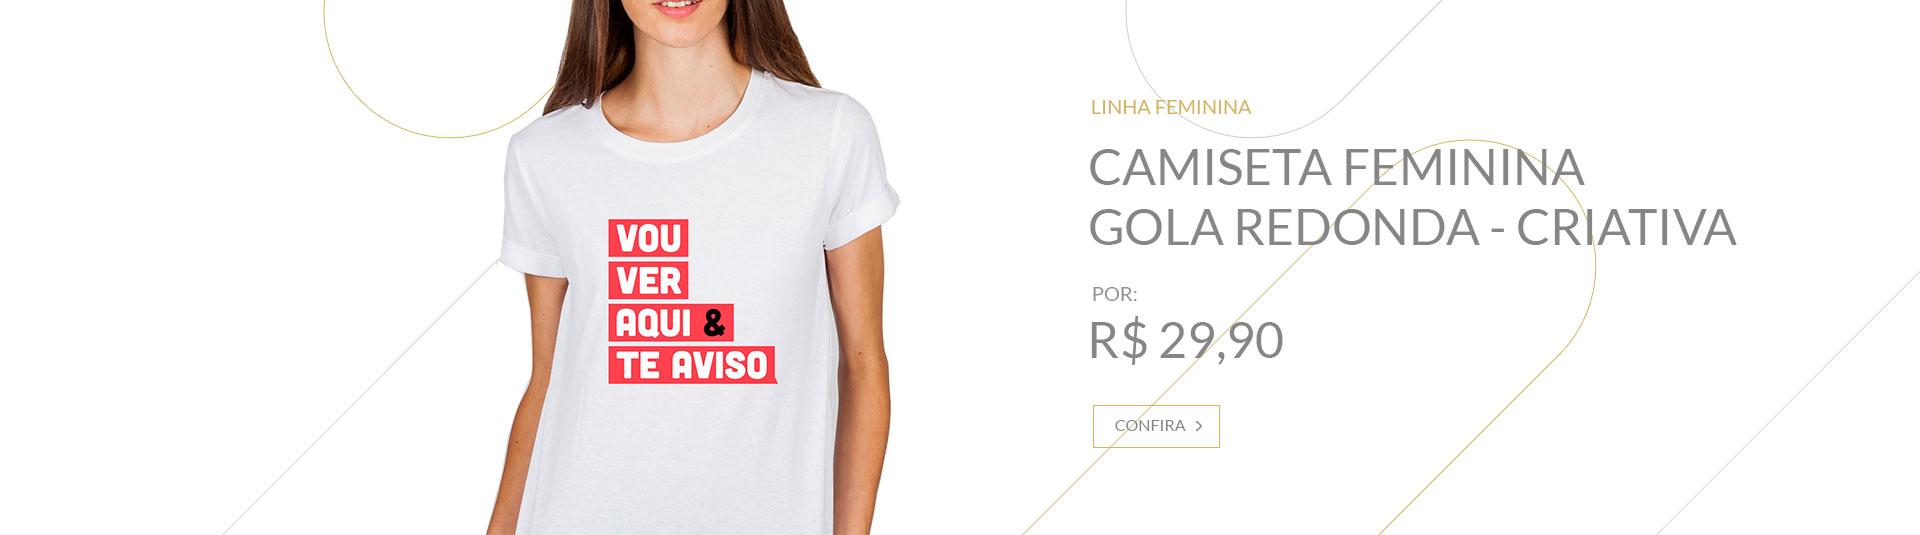 Banner Camiseta feminina